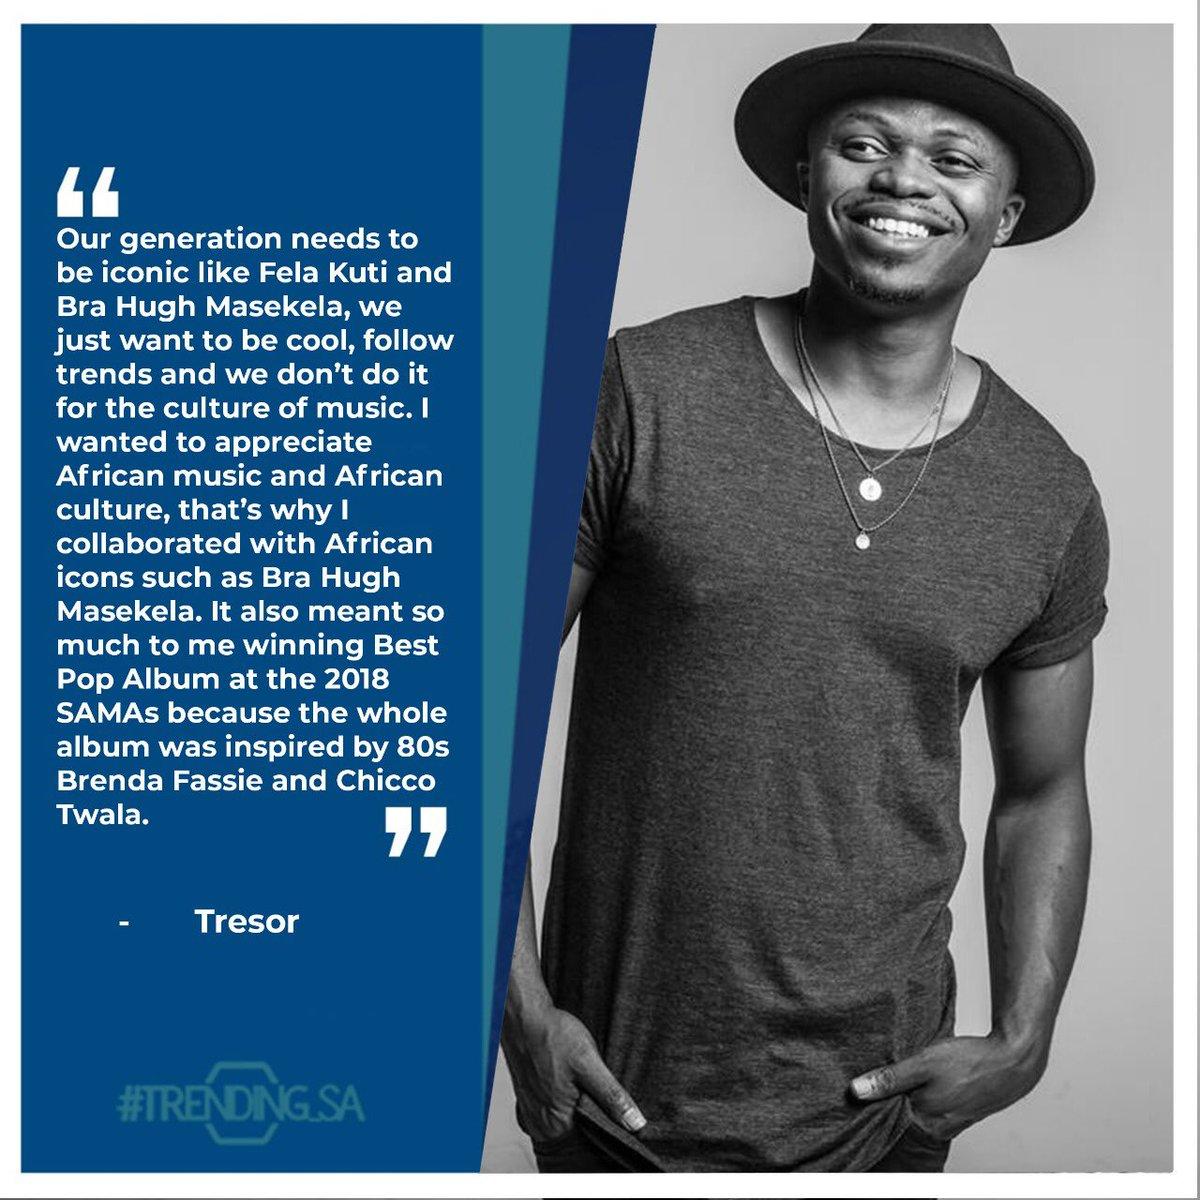 Pop Artist @tresorofficial on who inspired his album The Beautiful Madness. #tsaon3 #tsaonline